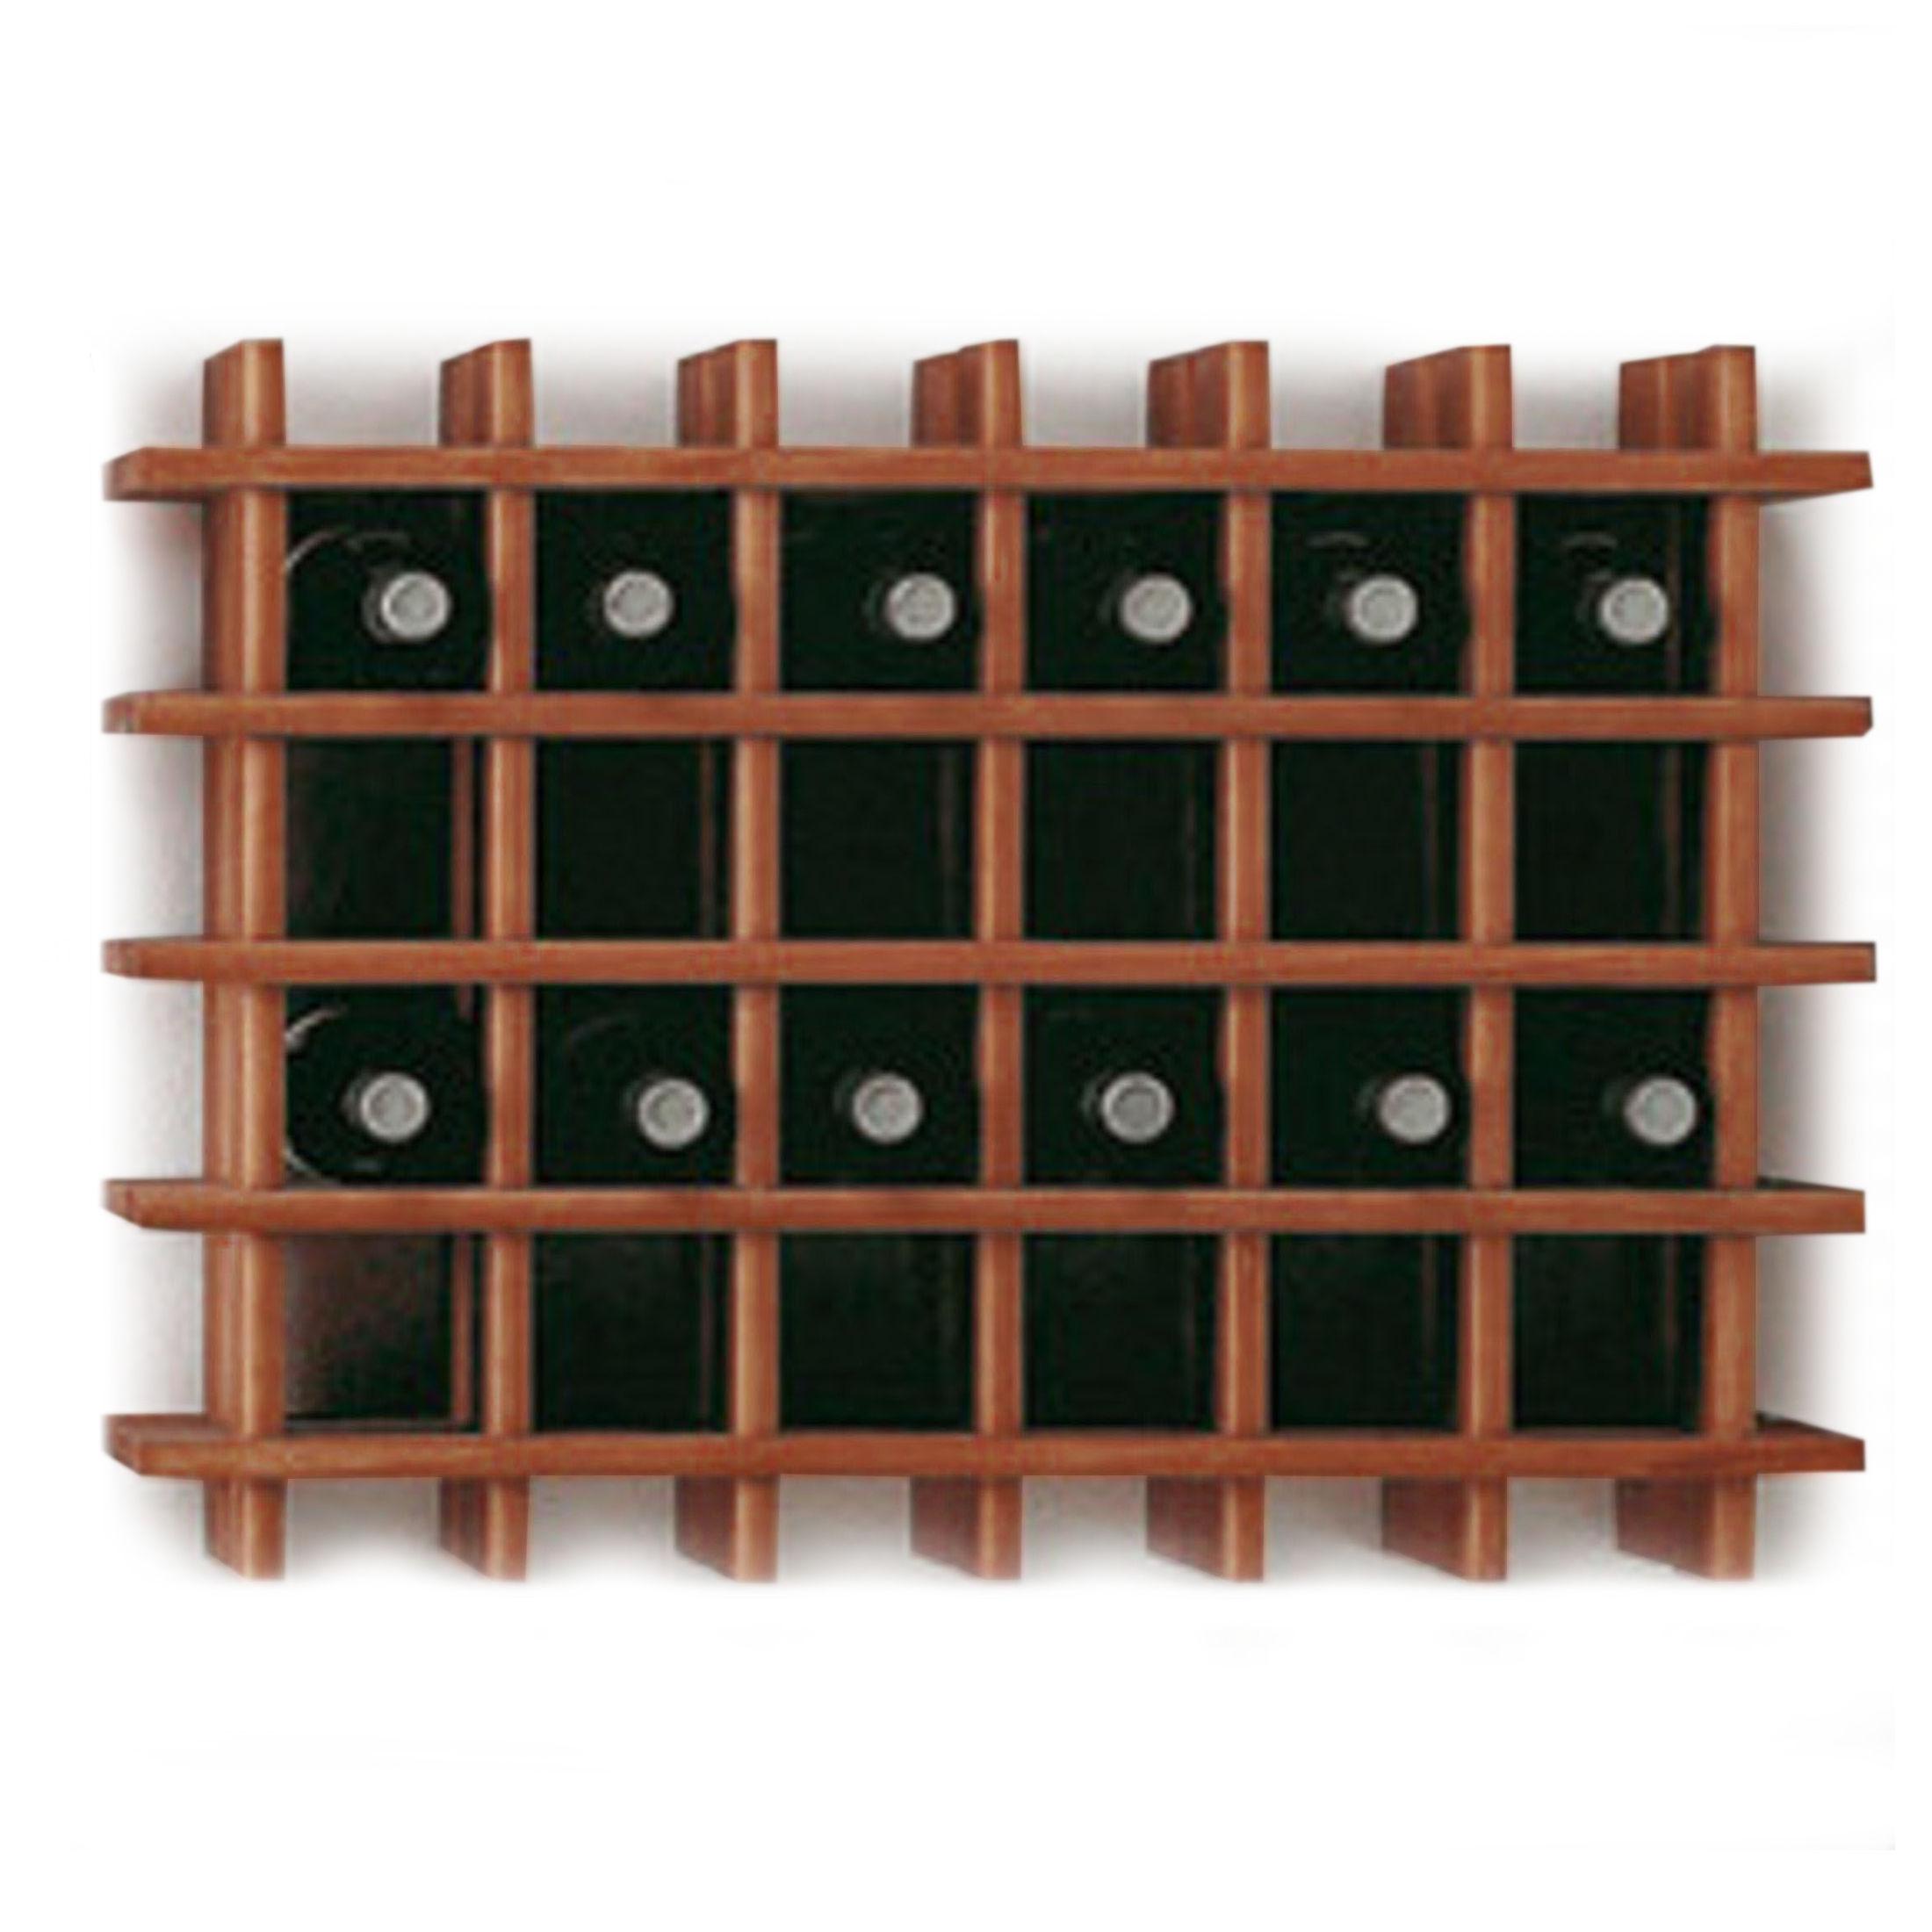 weinregal system primavino holz kiefer dunkelbraun stapelbar erweiterbar ebay. Black Bedroom Furniture Sets. Home Design Ideas